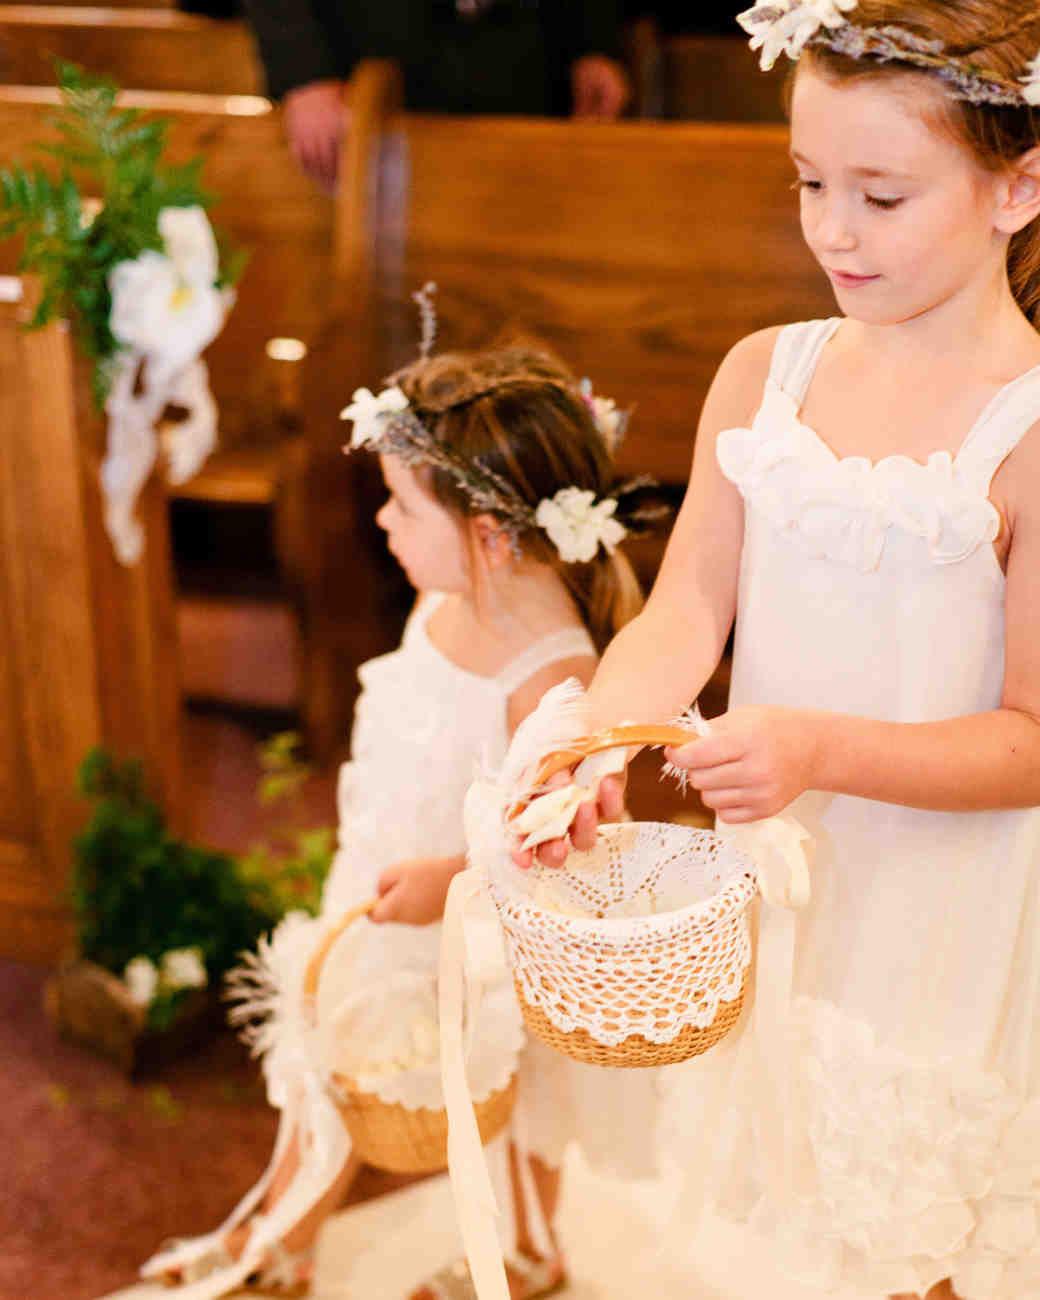 jola-tom-wedding-flowergirls-0614.jpg